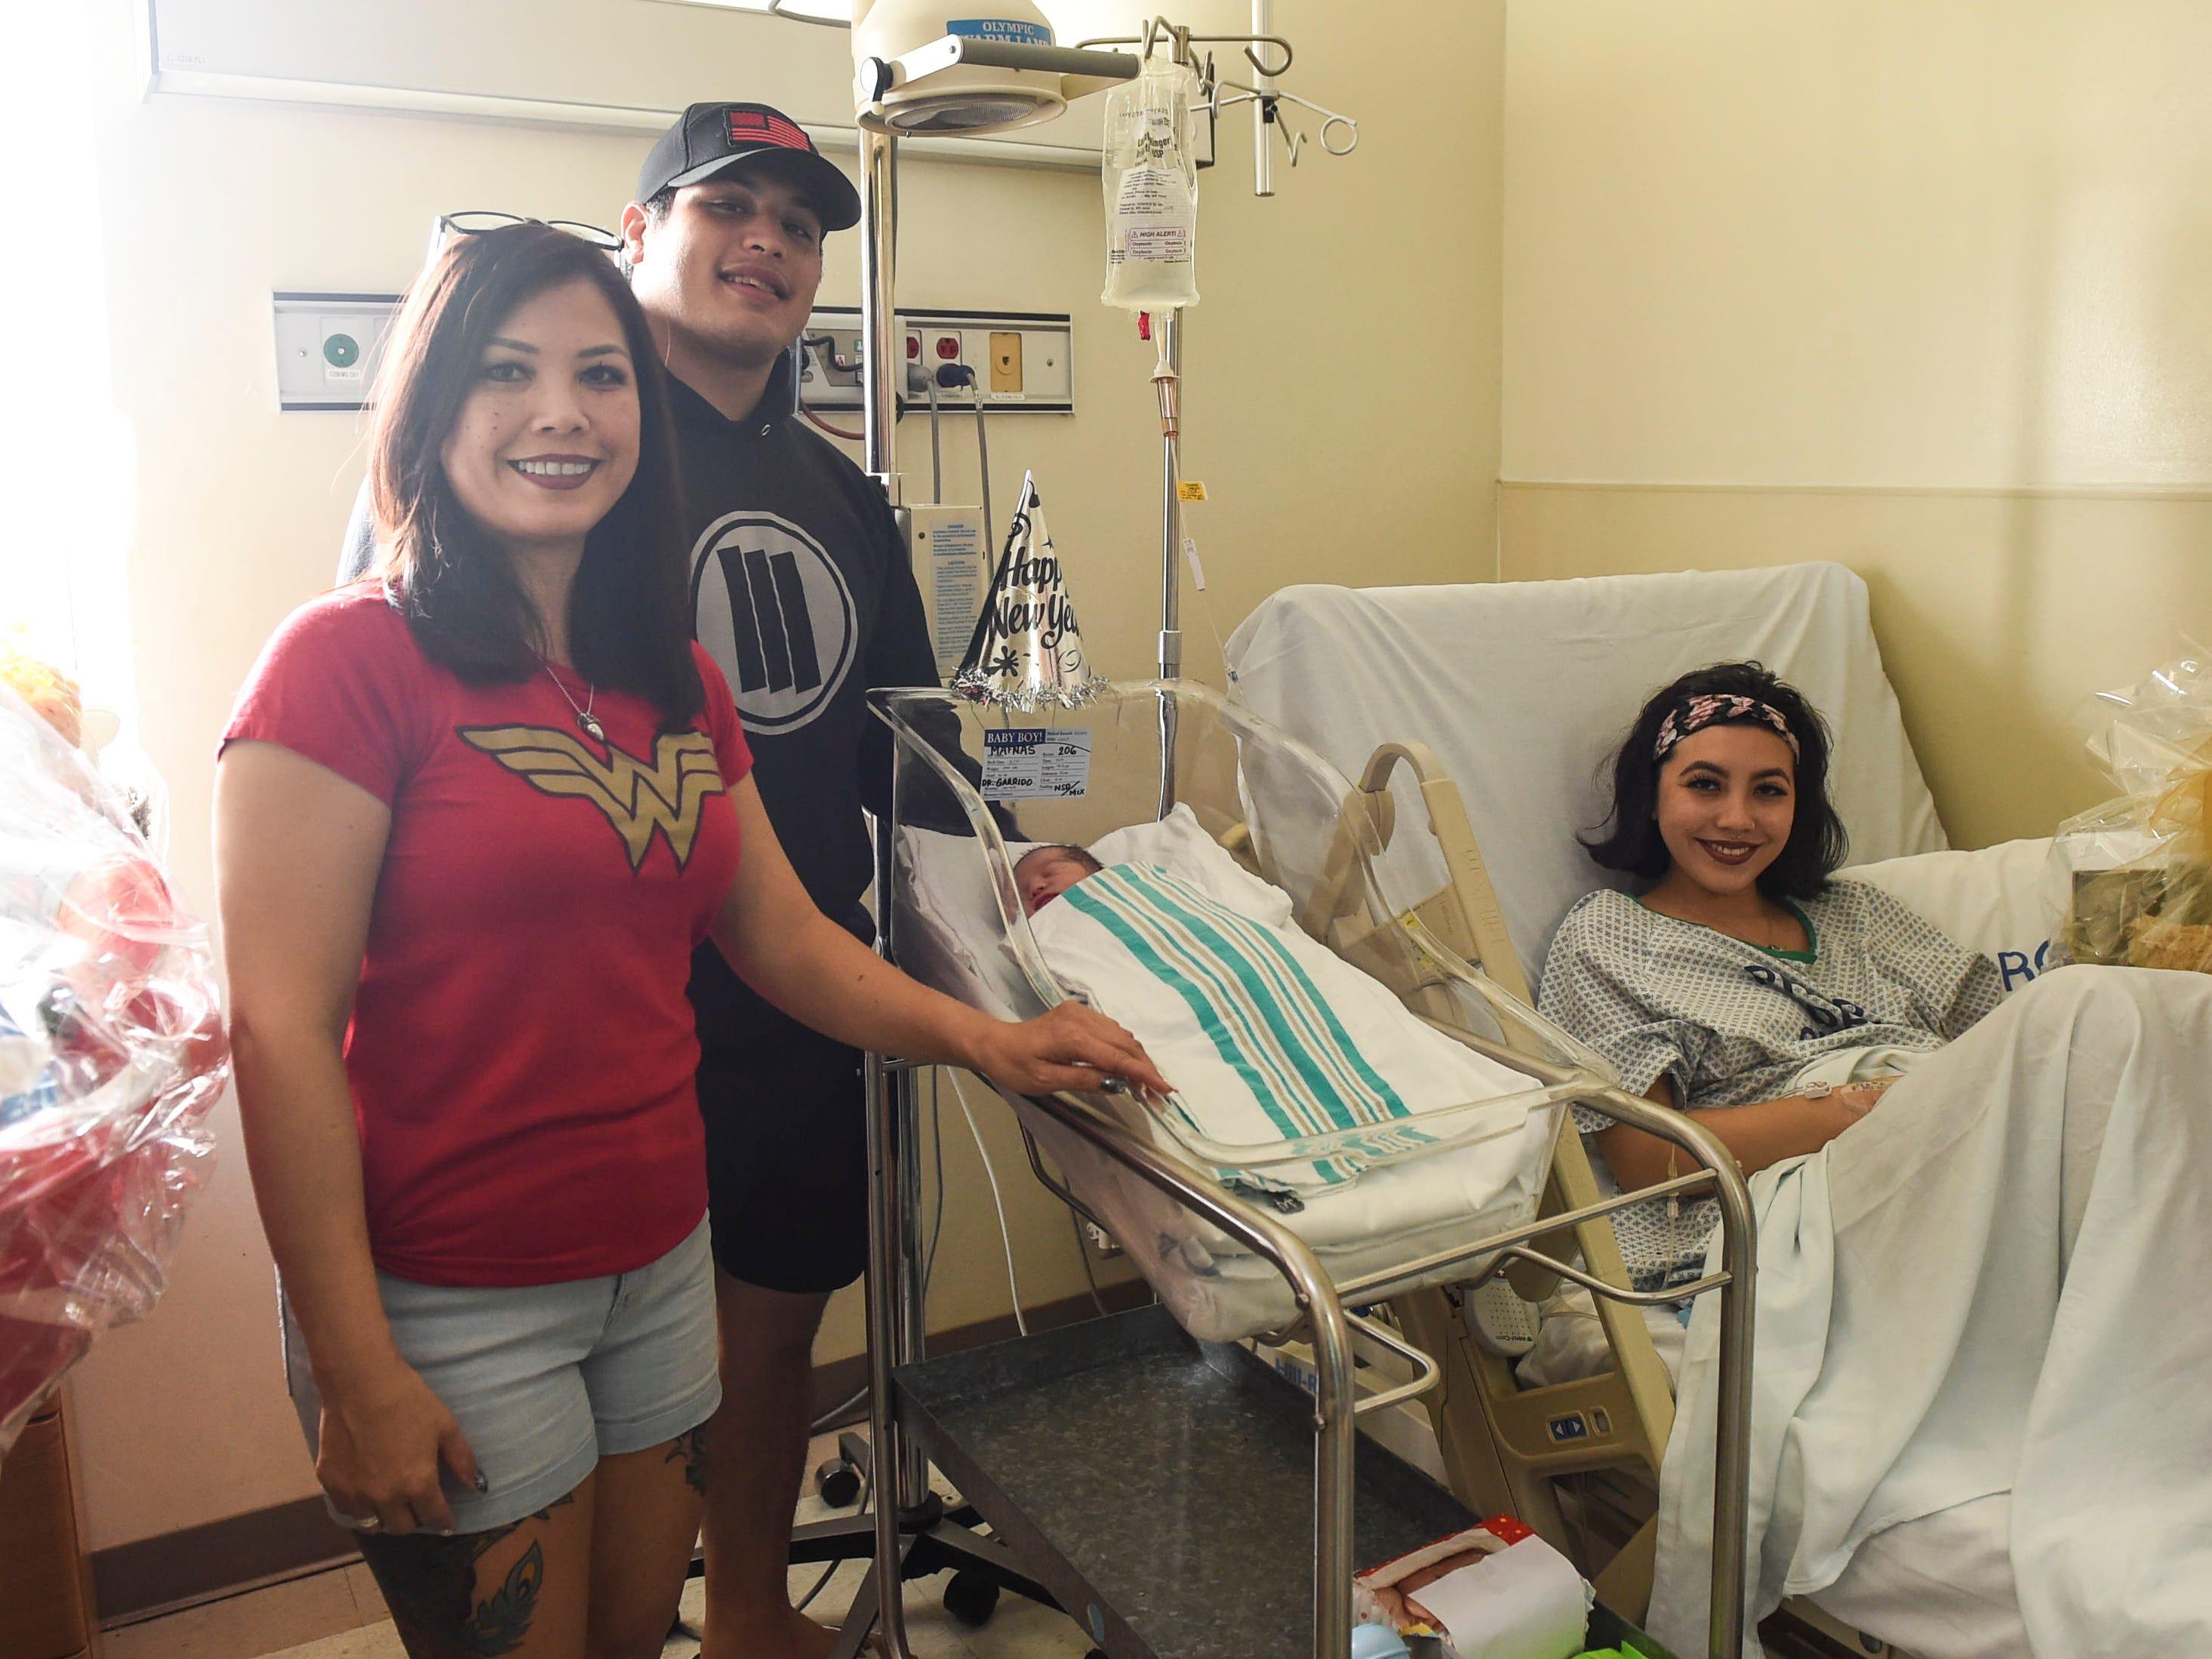 The Mafnas family welcomed their newborn baby, Malakai, at Guam Memorial Hospital in Tamuning on Jan. 1, 2019. From left: Darlene Garcia, Kyle Mafnas, Malakai Mafnas, and Desirae Mafnas.